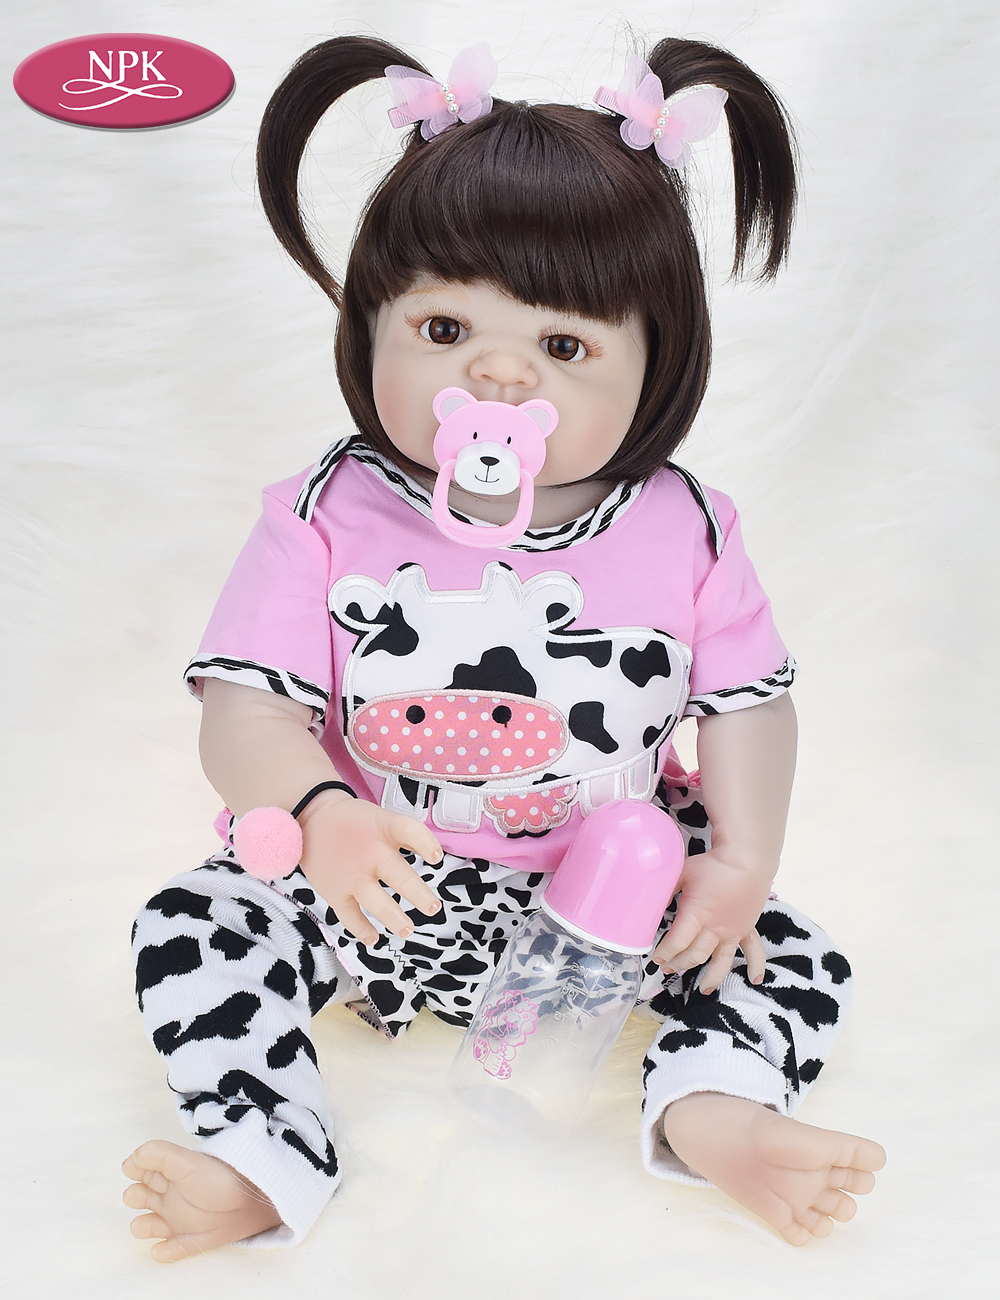 NPK Real 57CM Full Body SIlicone Girl Reborn Babies Doll Bath Toy Lifelike Newborn Princess Baby Doll Bonecas Bebe Reborn Menina (13)